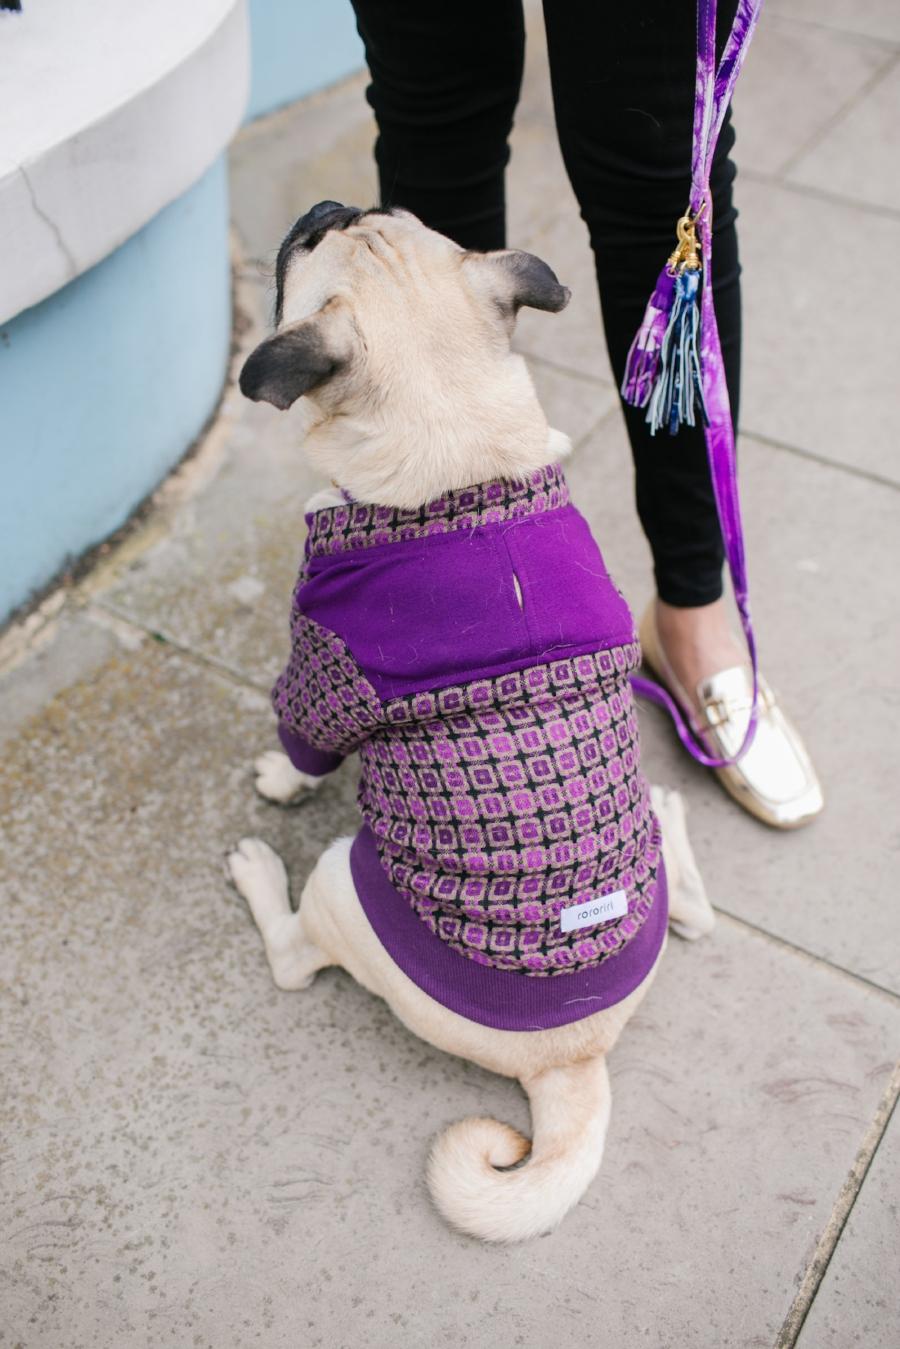 bestdogbloglondon-dogblog-london-uk-dogfashionblog-dogsinclothes-pug-puglife-dapperdogs-dogfriendly-fashionandlifestyle-londonblogger-metallicloafers-tassellead-newyork-falltrends-humanandhound-style-twinning-nottinghill-best-streetstyle-pugswag-fashioninspiration